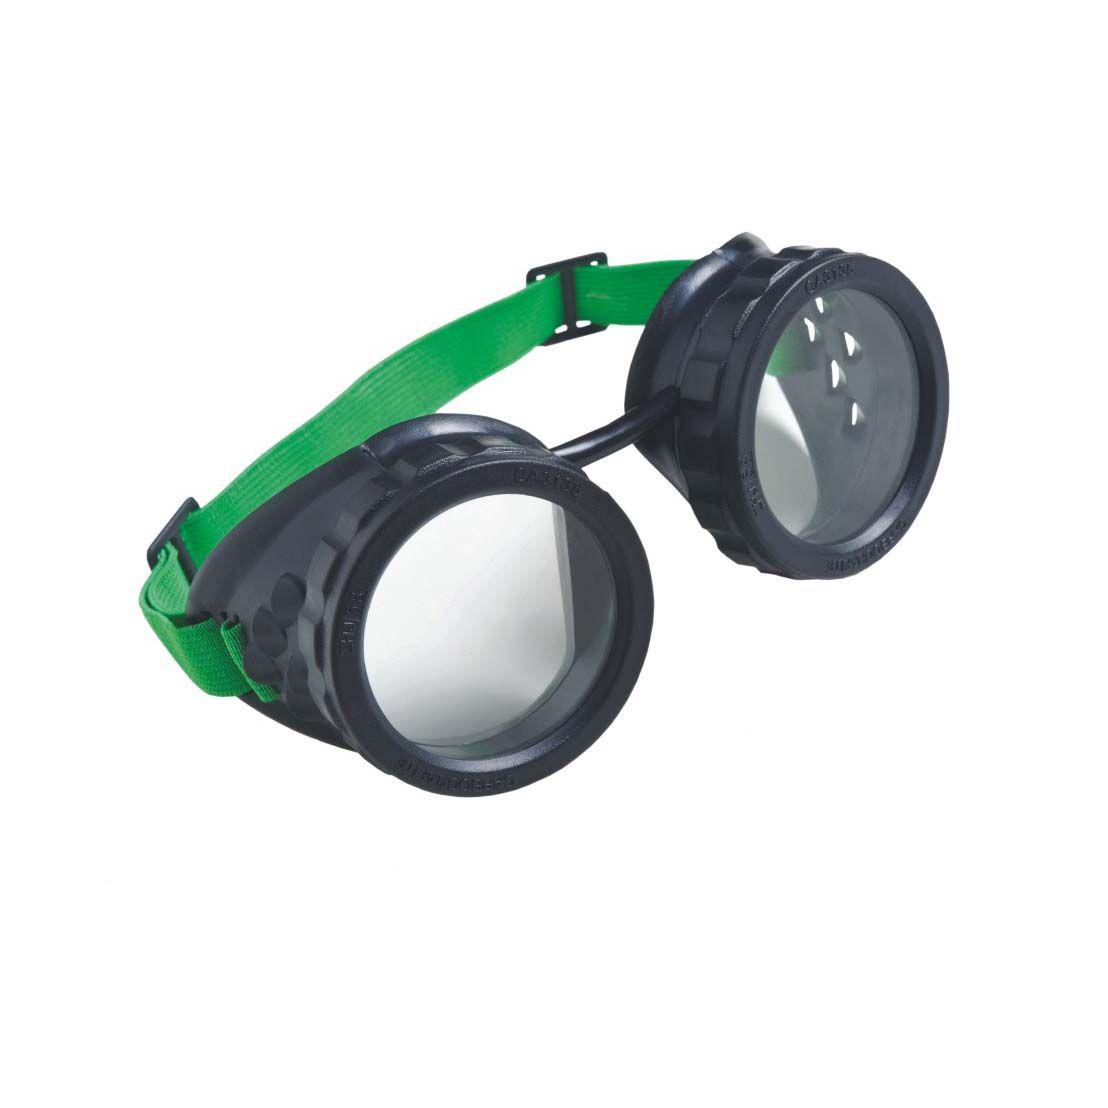 Óculos Maçariqueiro  Carbografite - CA 3135